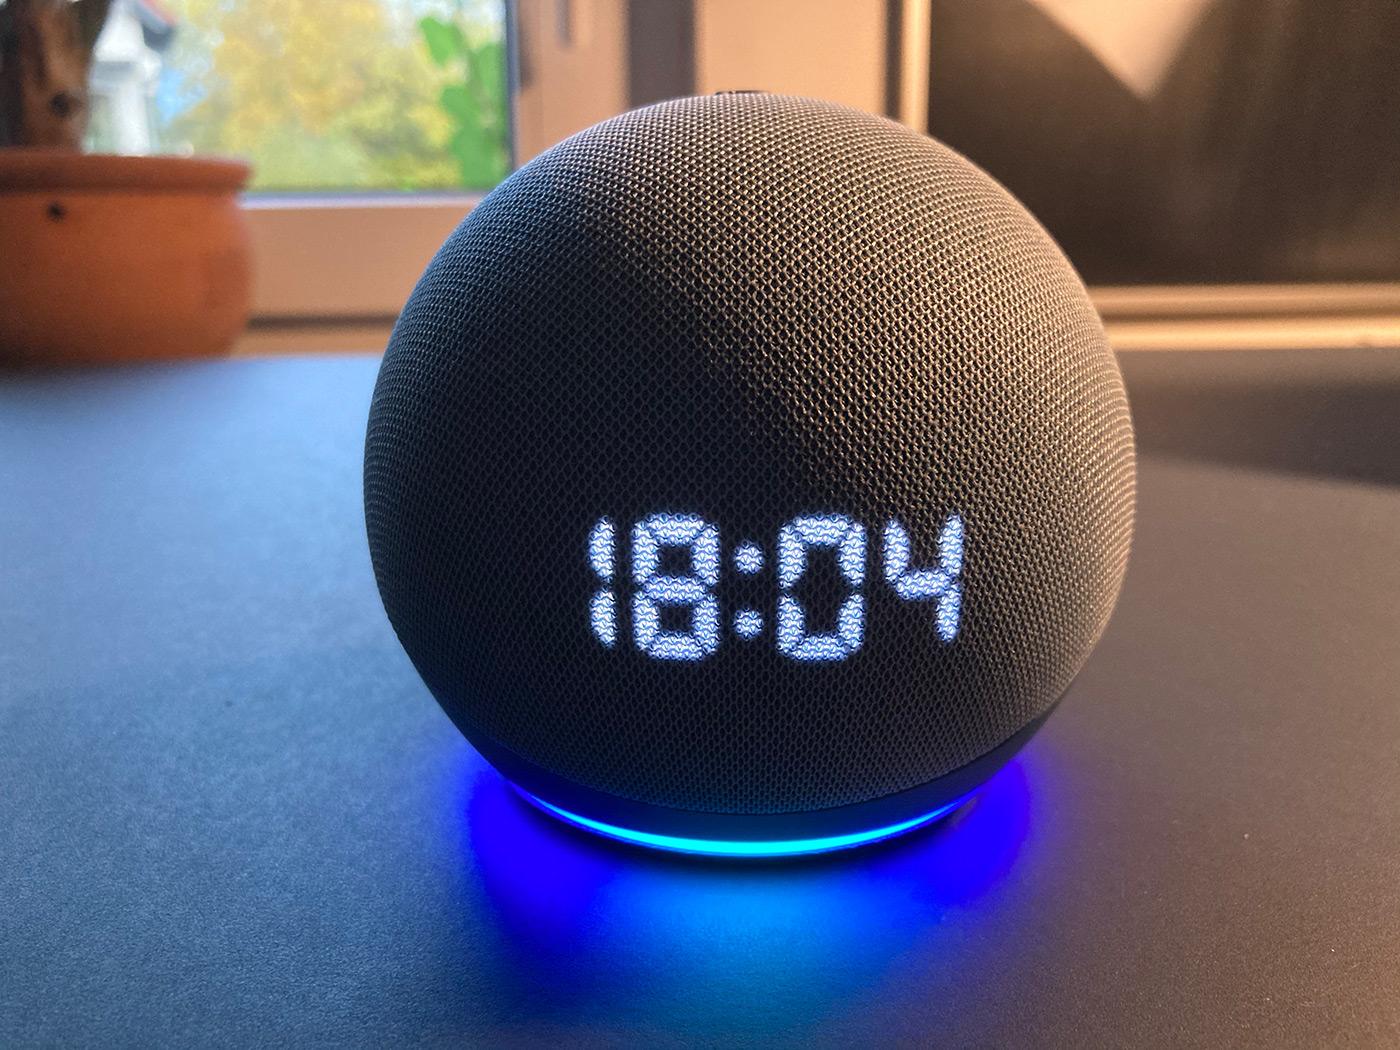 Echo Verkaufsstart Ein Blick auf den neuen Echo Dot › ifun.de